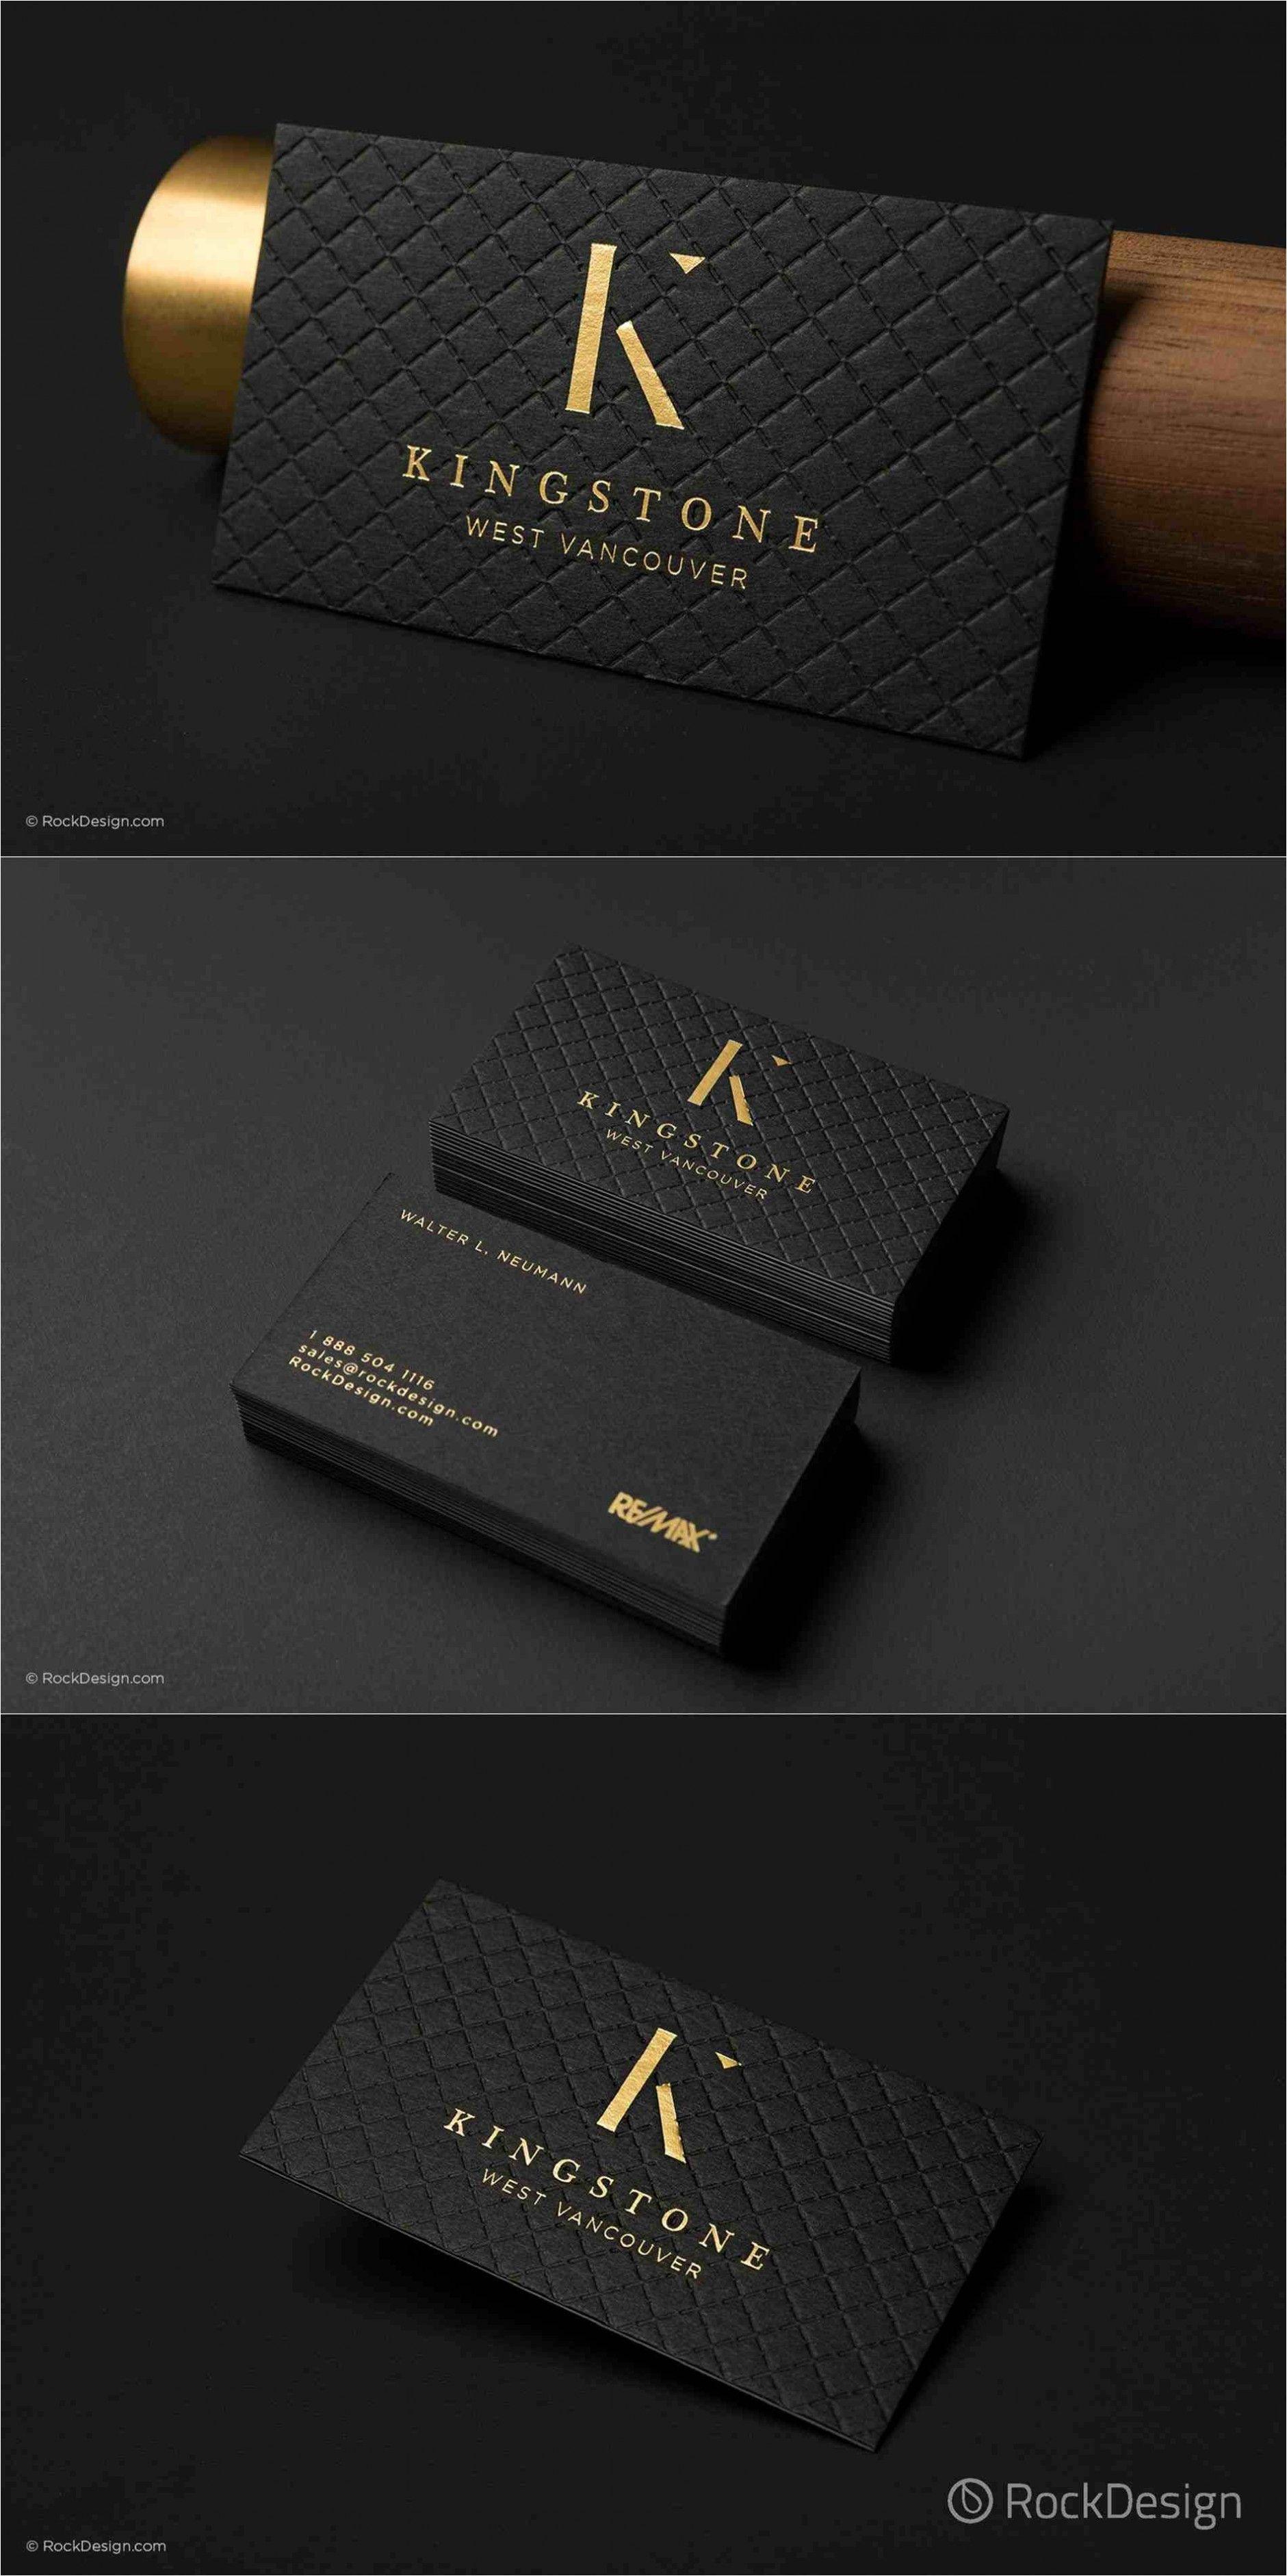 Standard Business Card Size Pixels Elegant Business Card Design Ideas For Fashion C Foil Business Cards Elegant Business Cards Design Business Card Inspiration